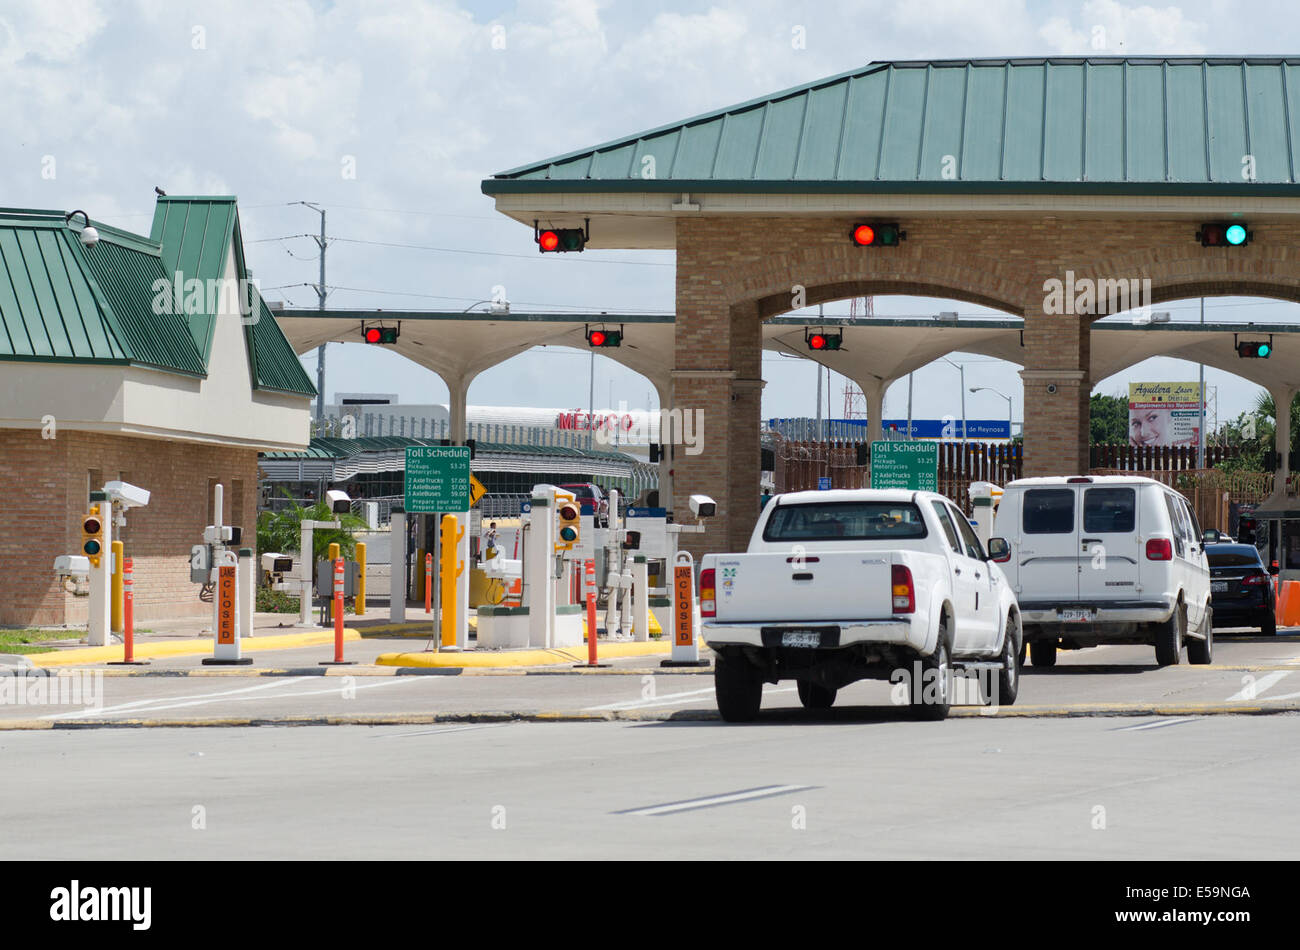 Mcallen texas usa 13th july 2014 mcallen hidalgo border crossing looking across to mexico from the mcallen hidalgo international bridge border